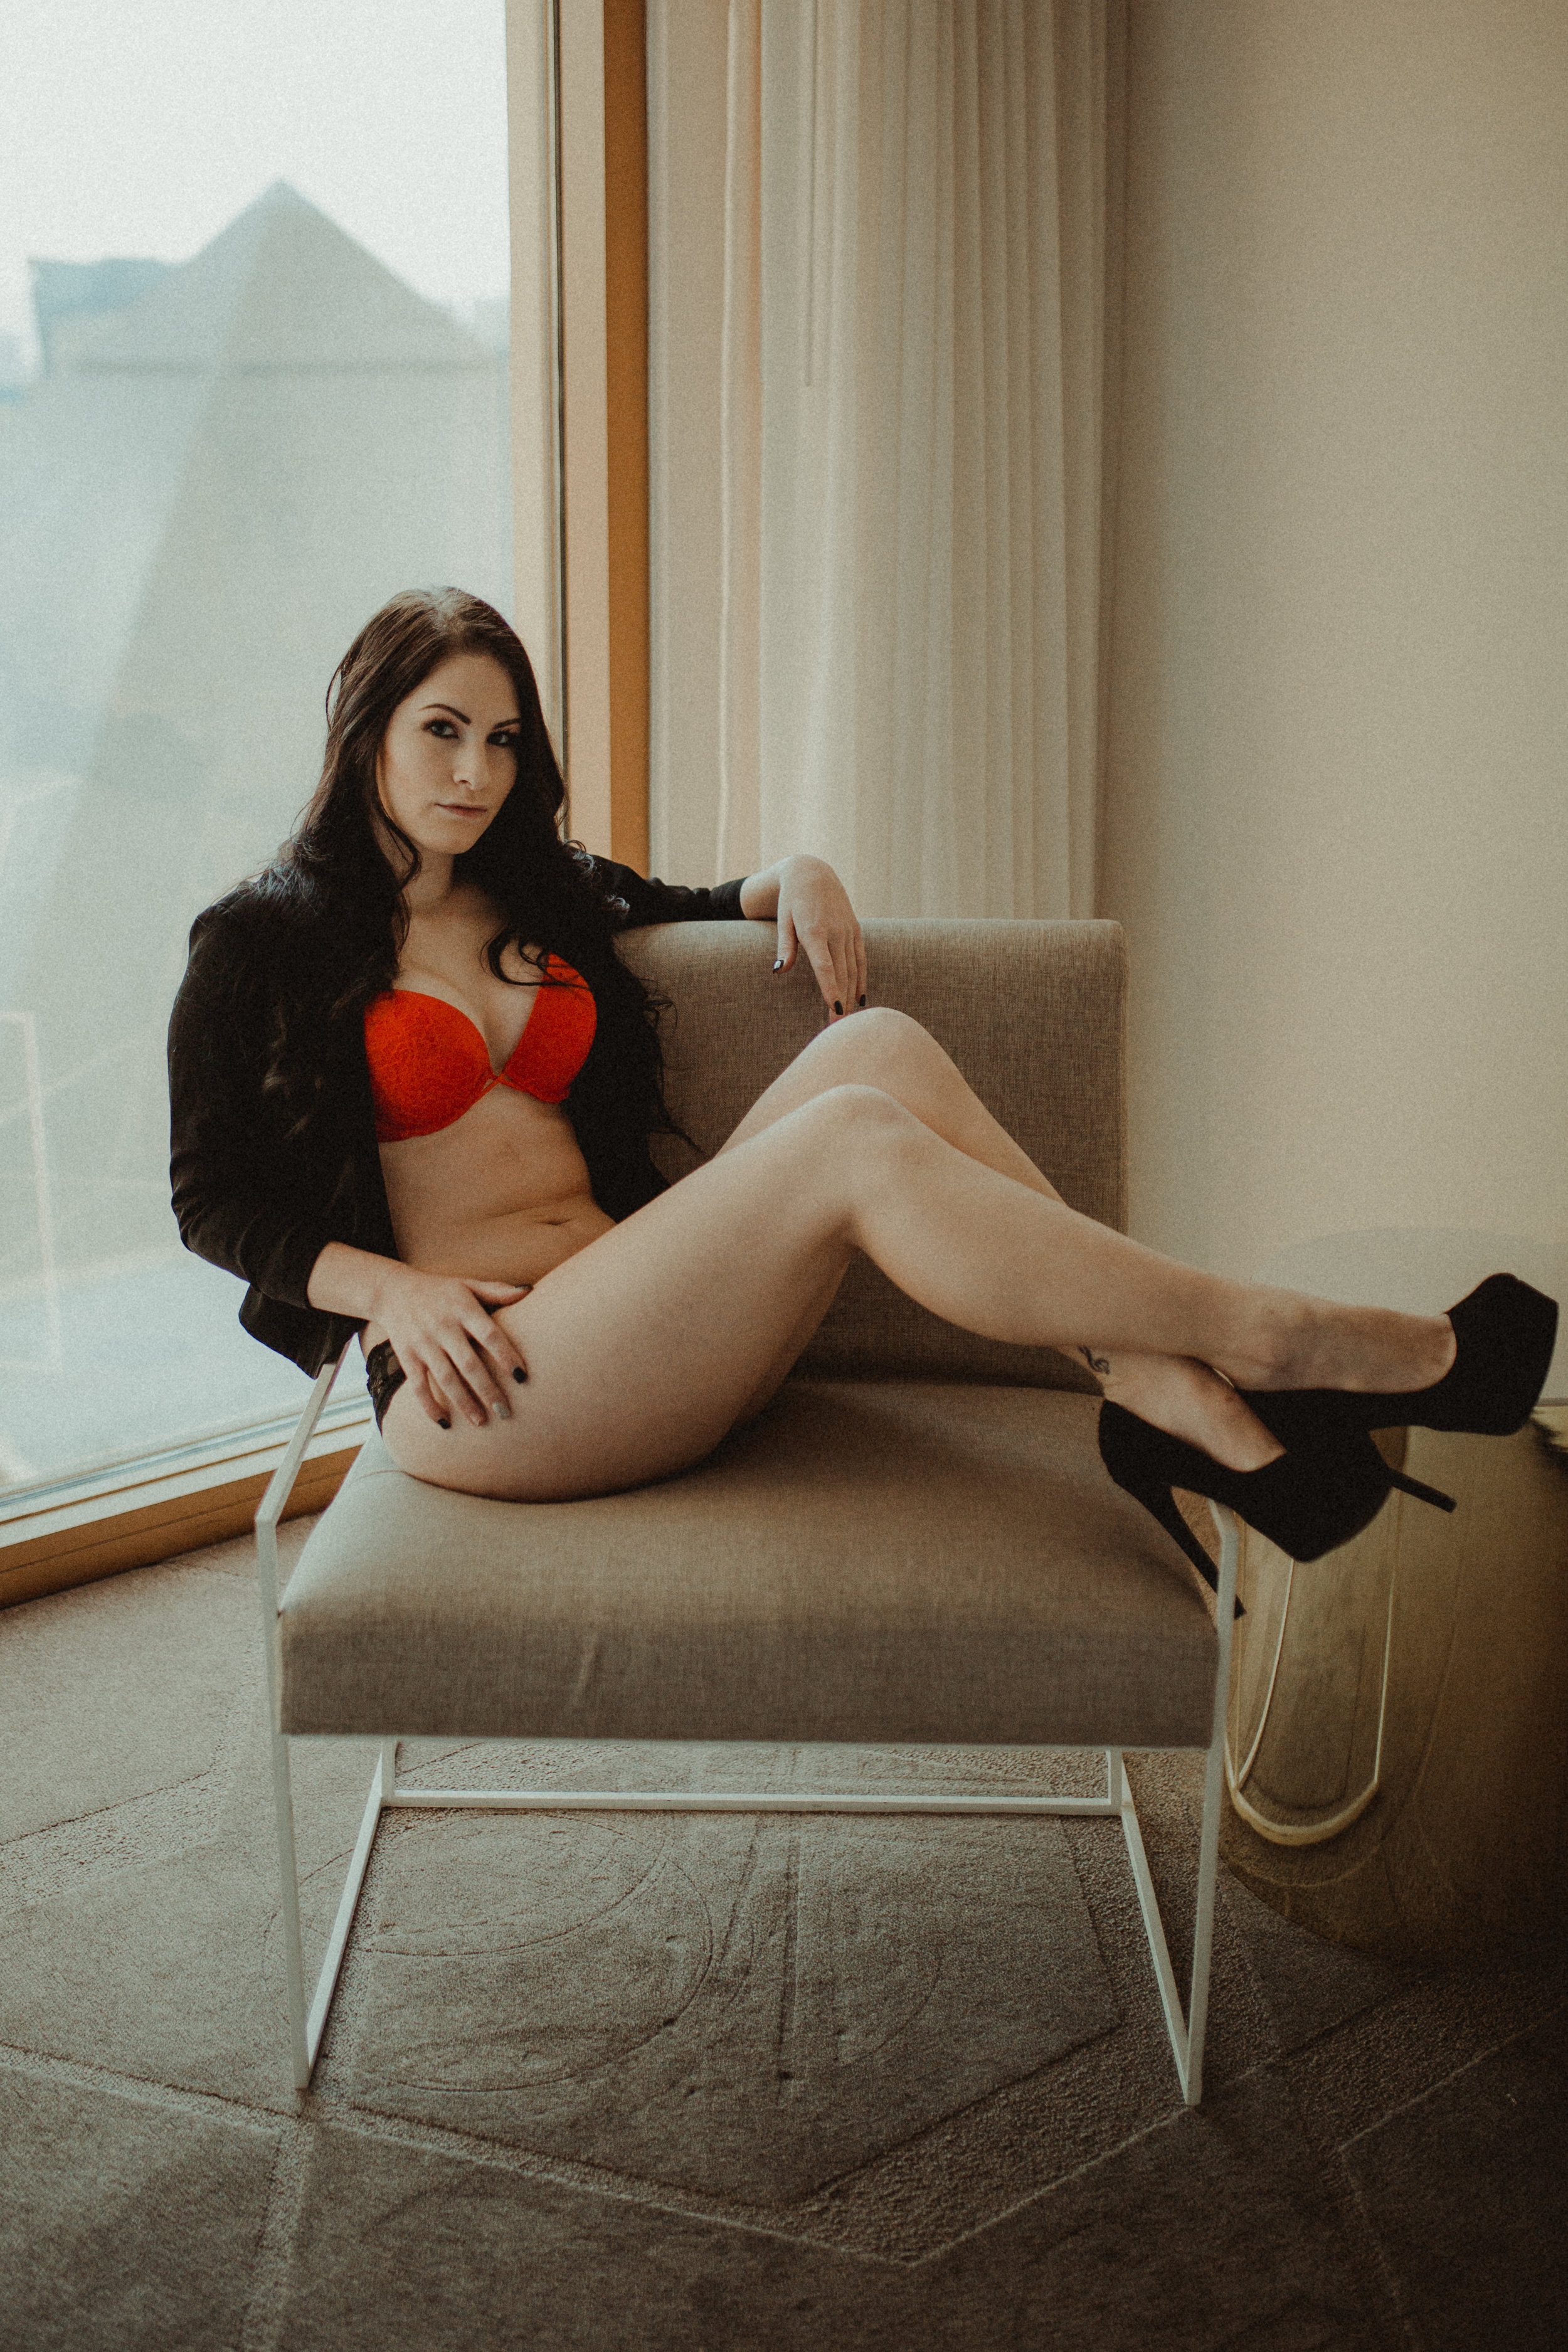 Seattle Boudoir Photographer - Las Vegas Boudoir Photography - Portland Boudoir Photographer - Tasteful Boudoir - Seattle Photographer - PNW Photographer - Confidence - Empowerment